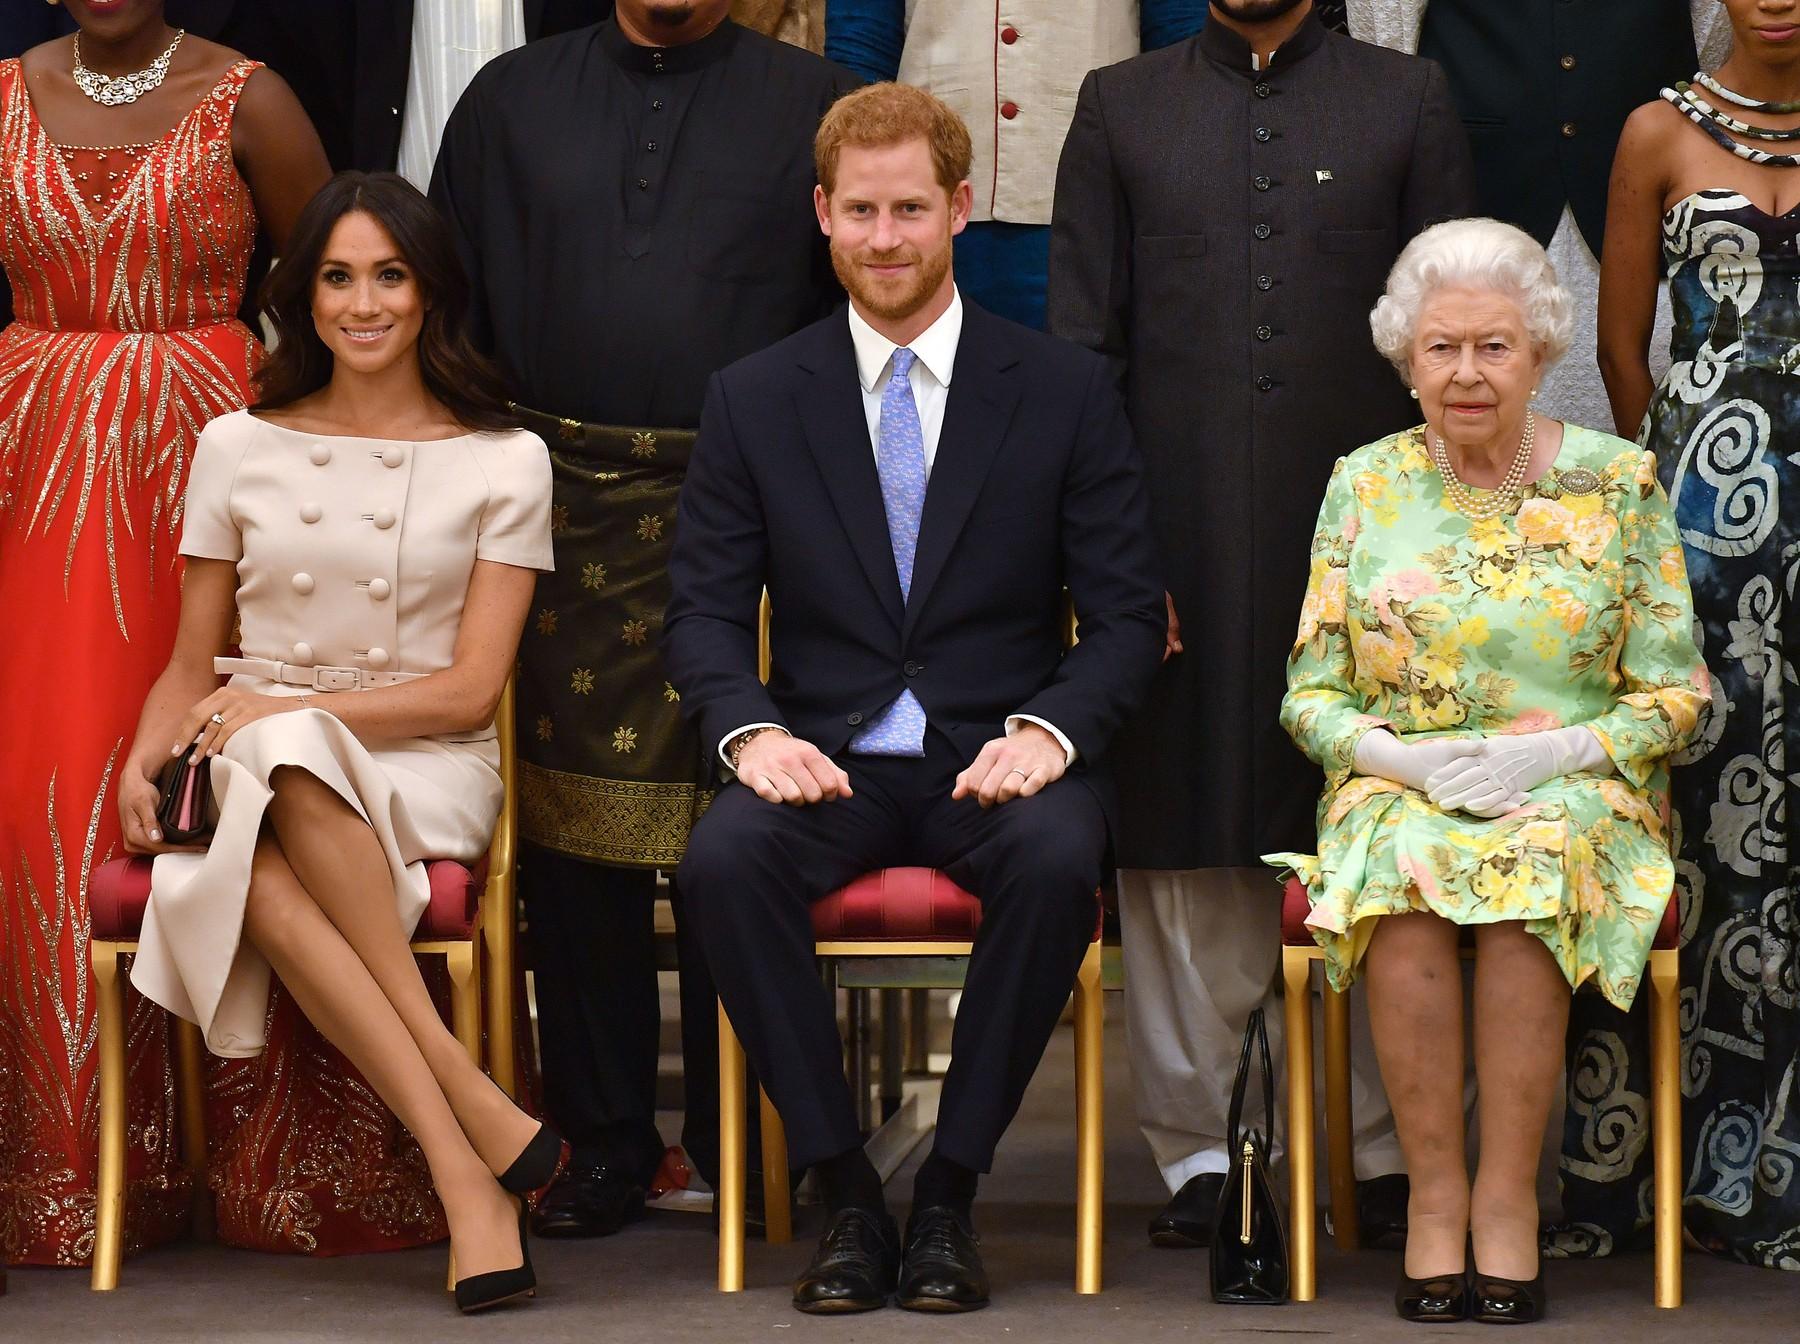 Megan, princ Hari i kraljica Elizabeta